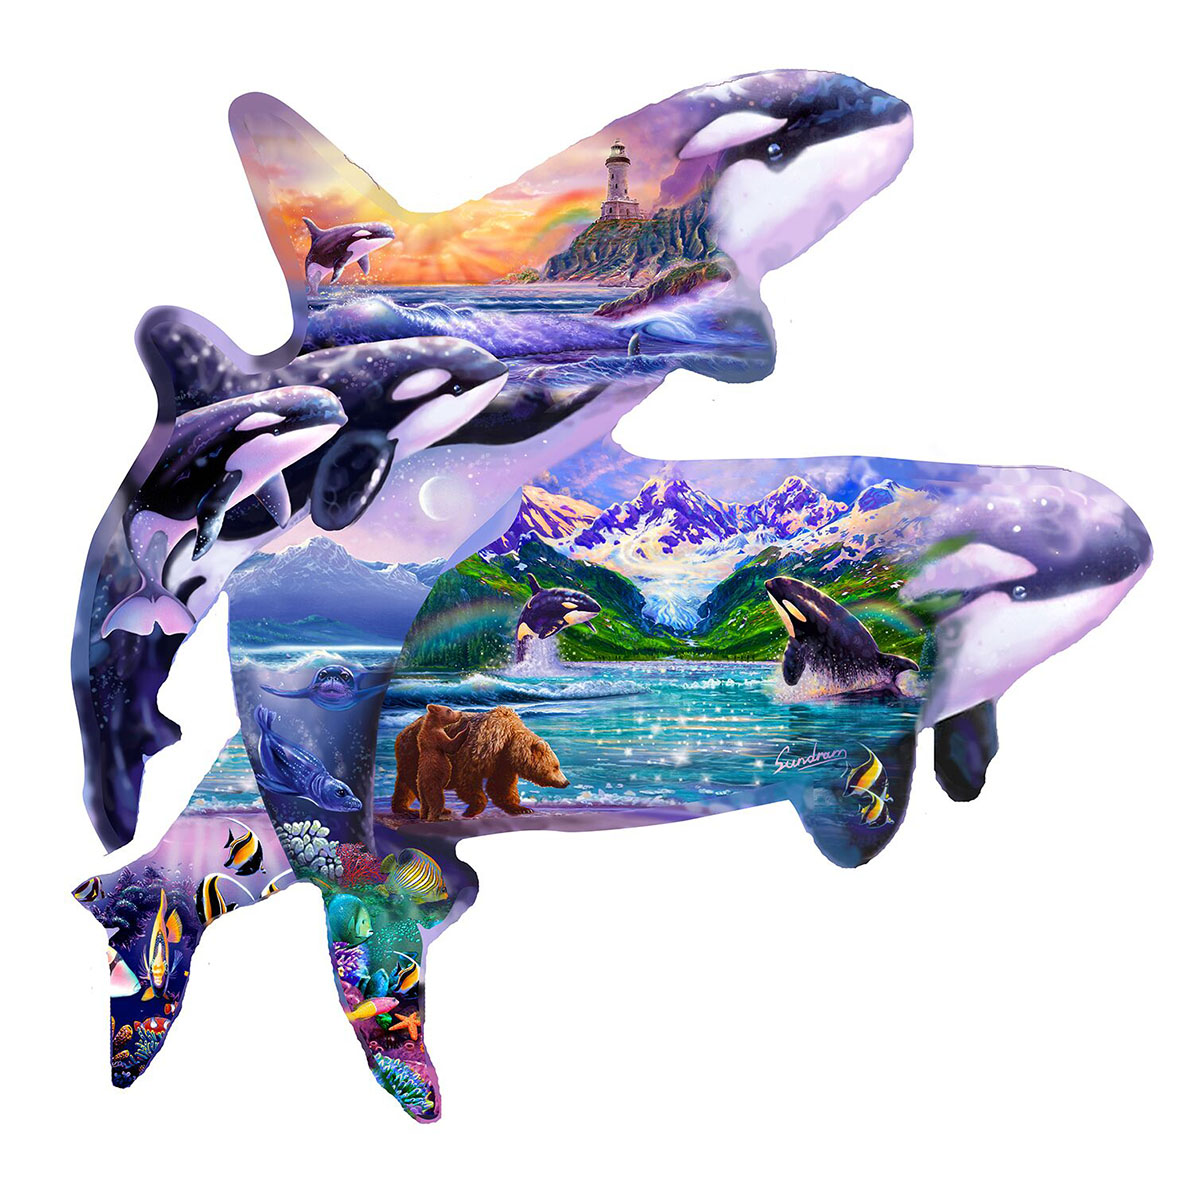 steve-sundram-orca-habitat